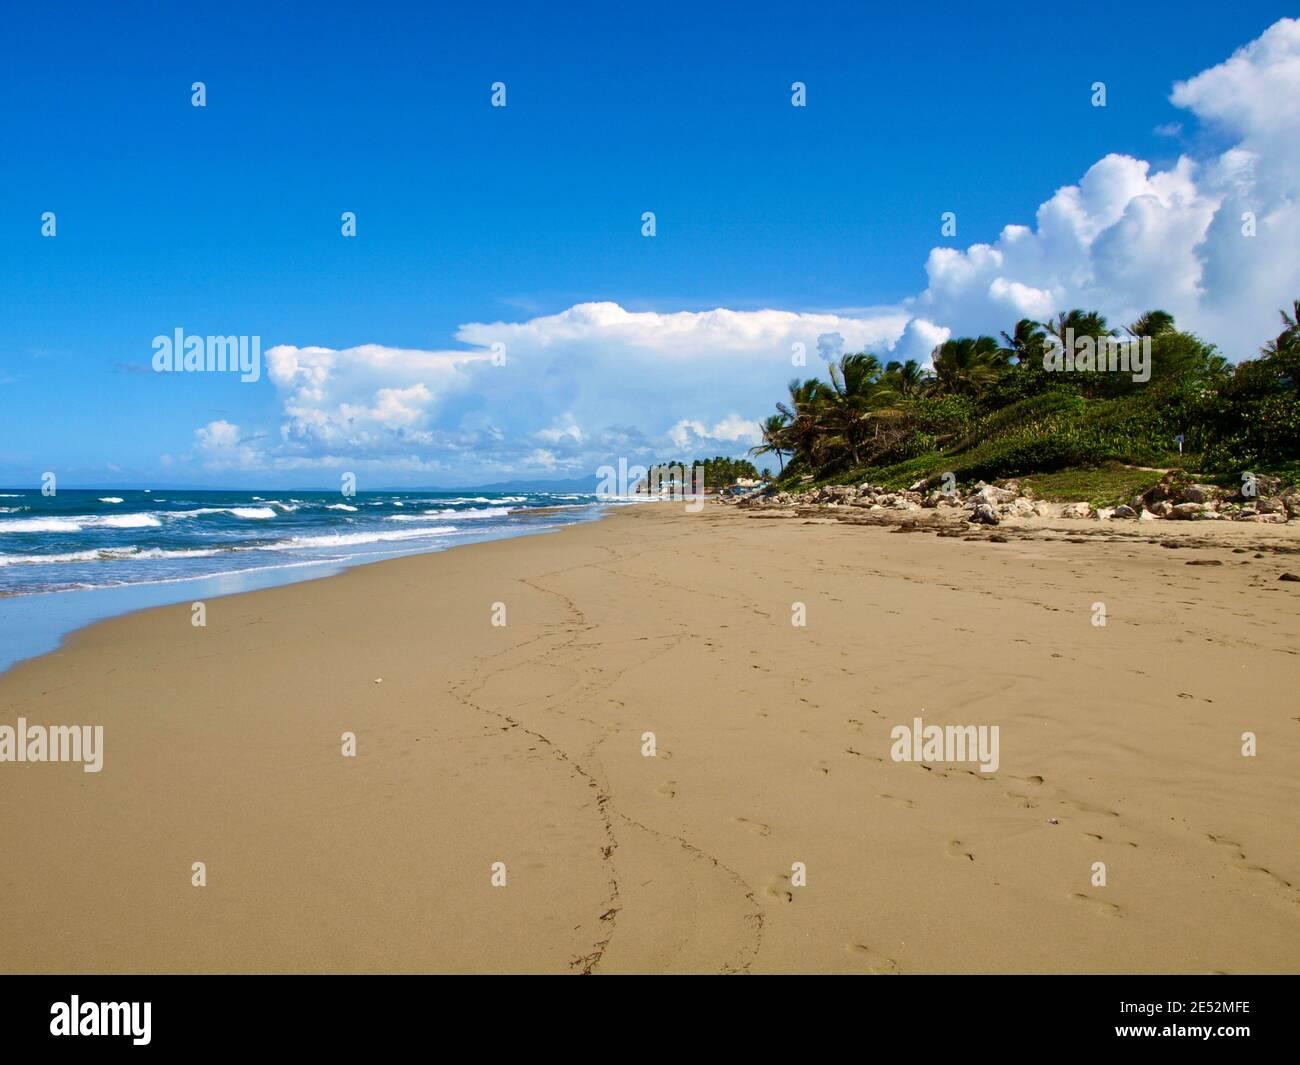 A beach near Sosua, on the north coast of the Dominican Republic. Stock Photo